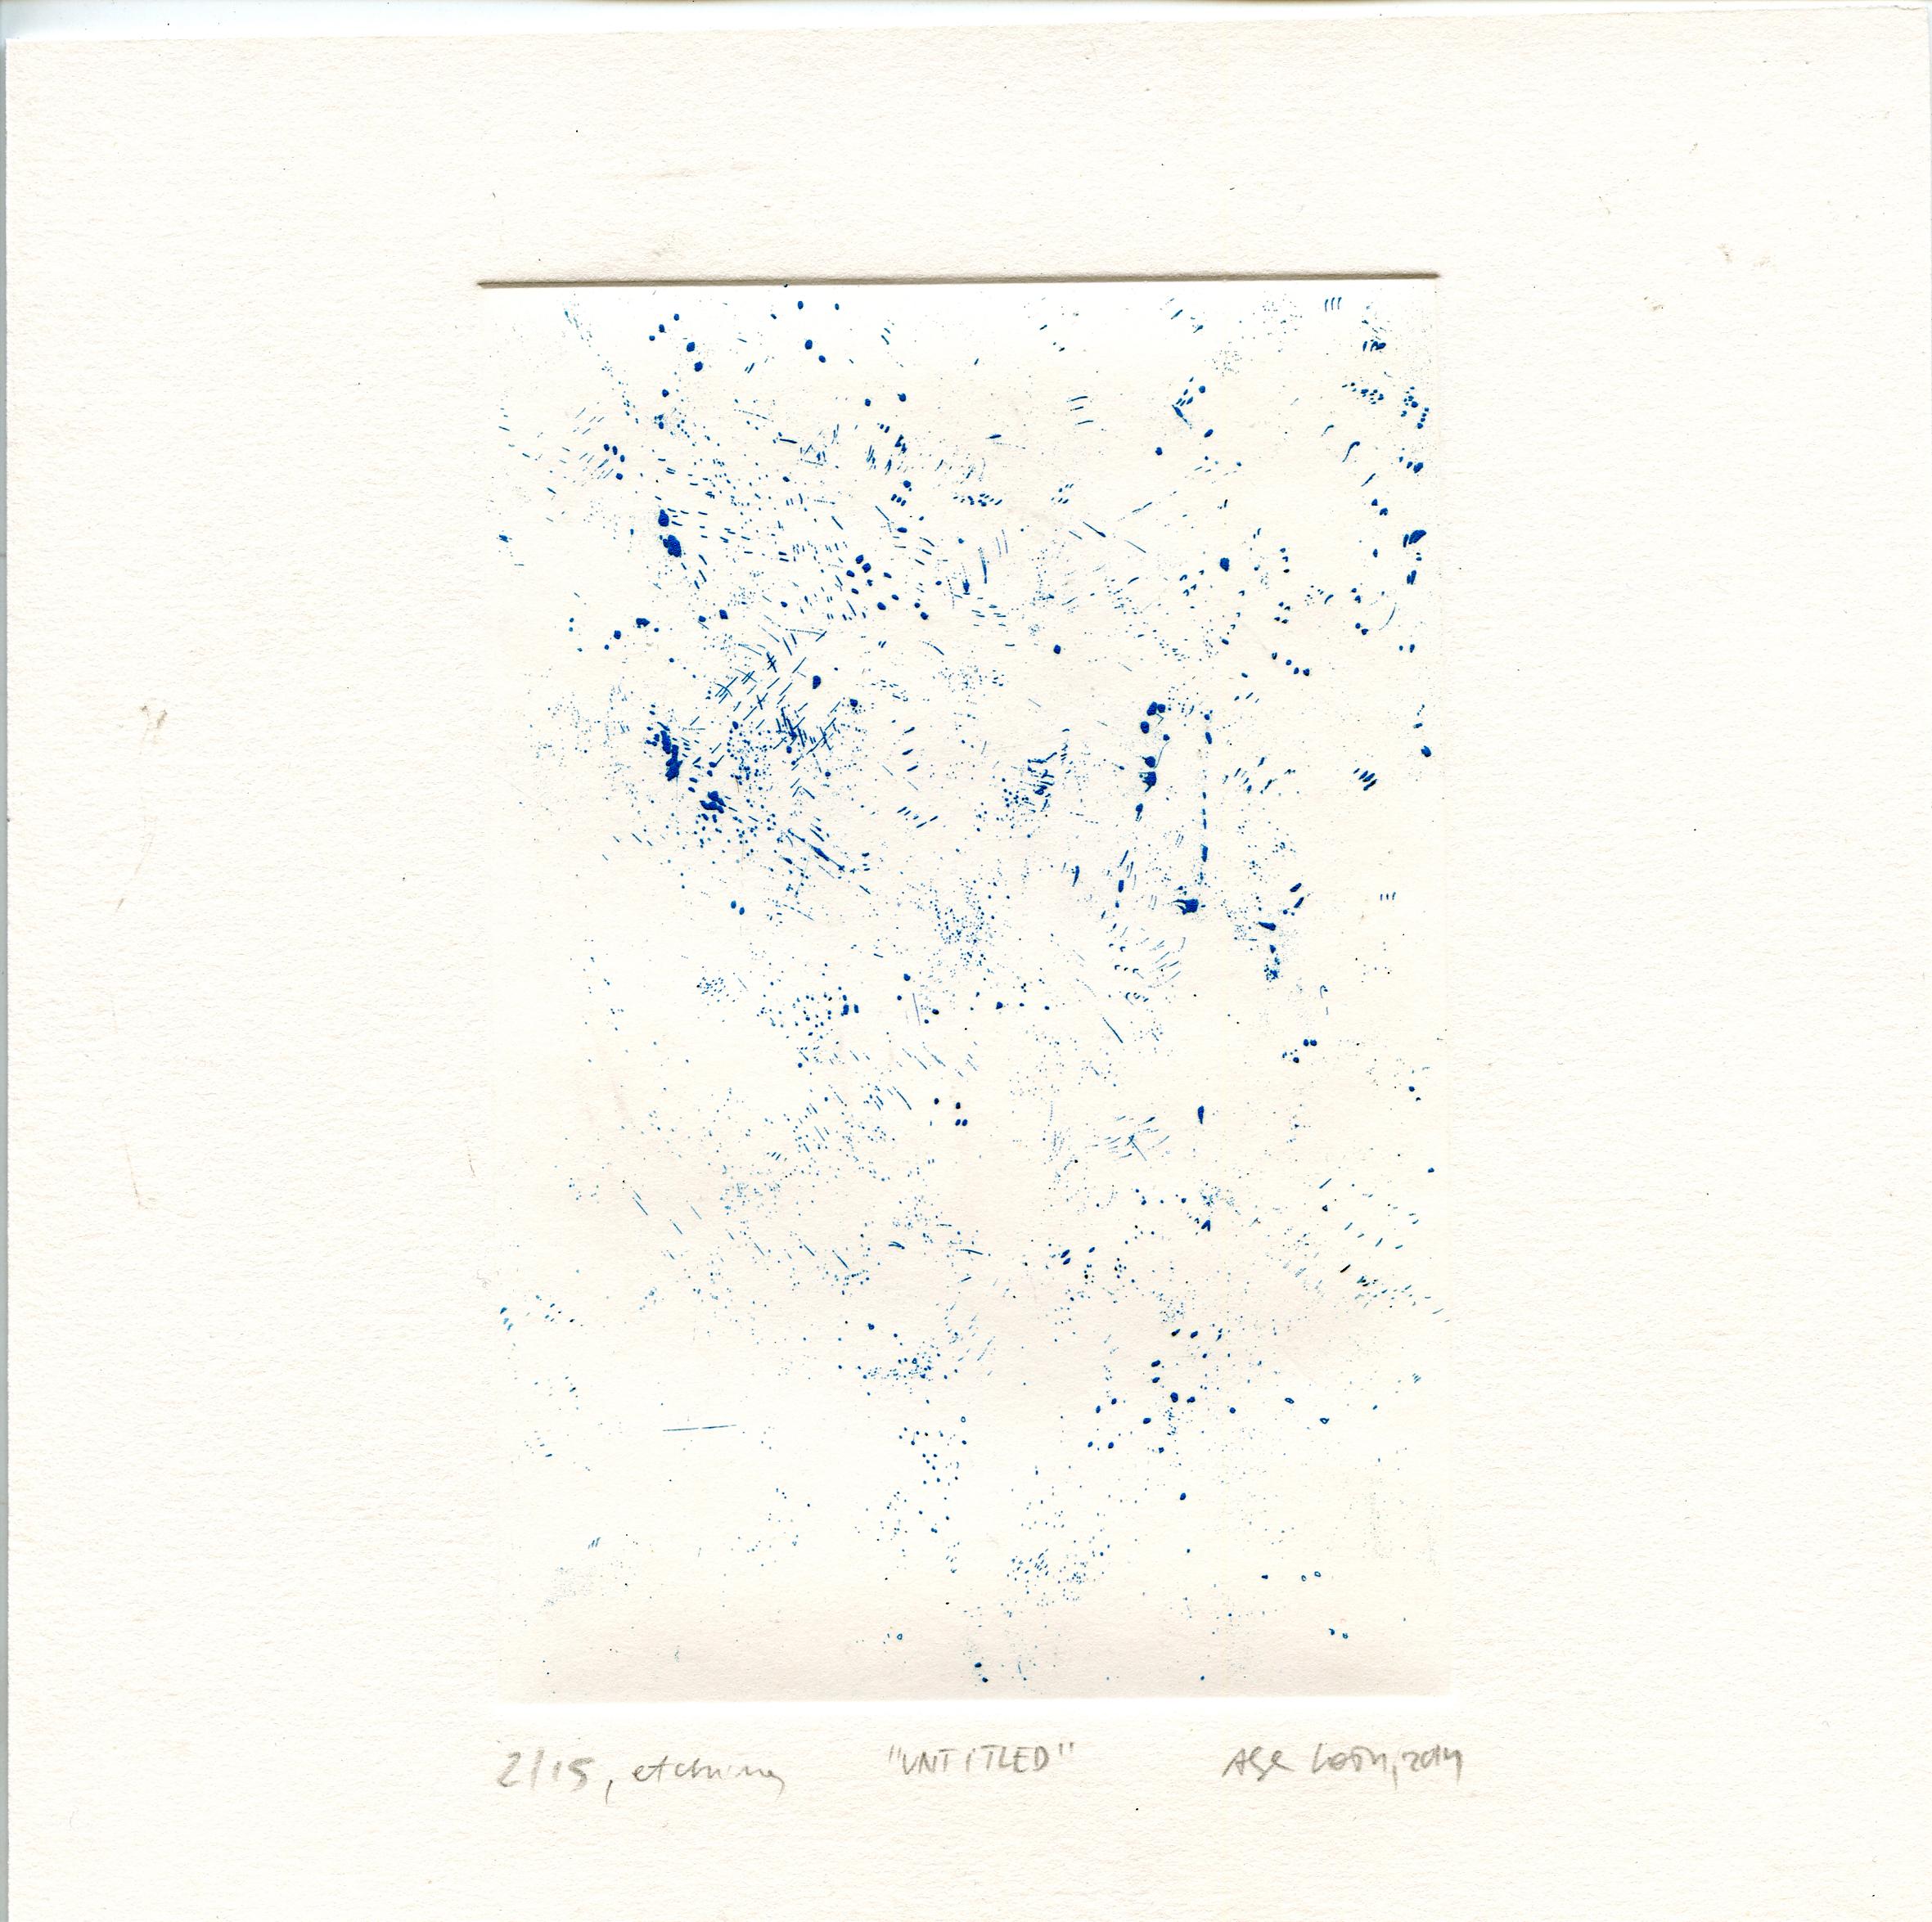 košar, Alja: Untitled etching